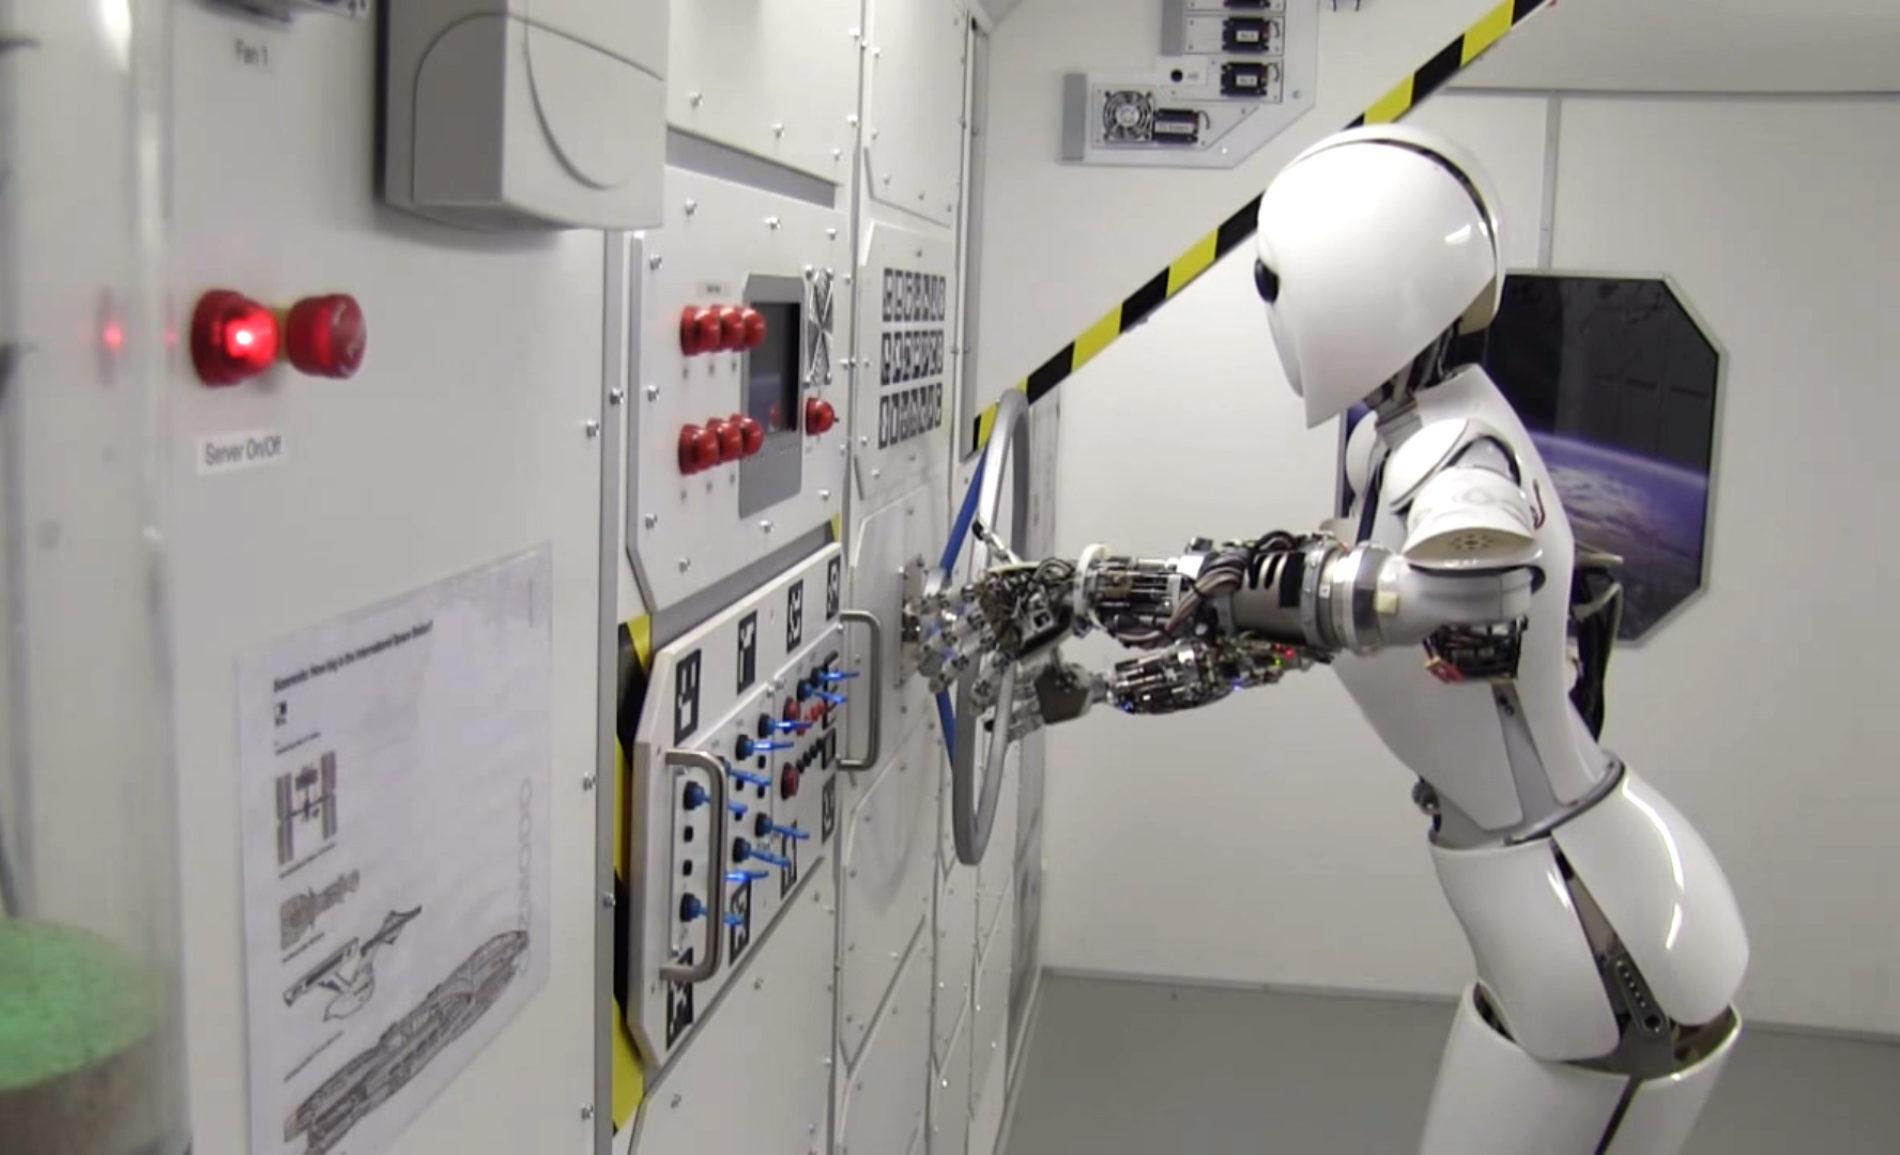 AILA – humanoid designed to assist astronauts